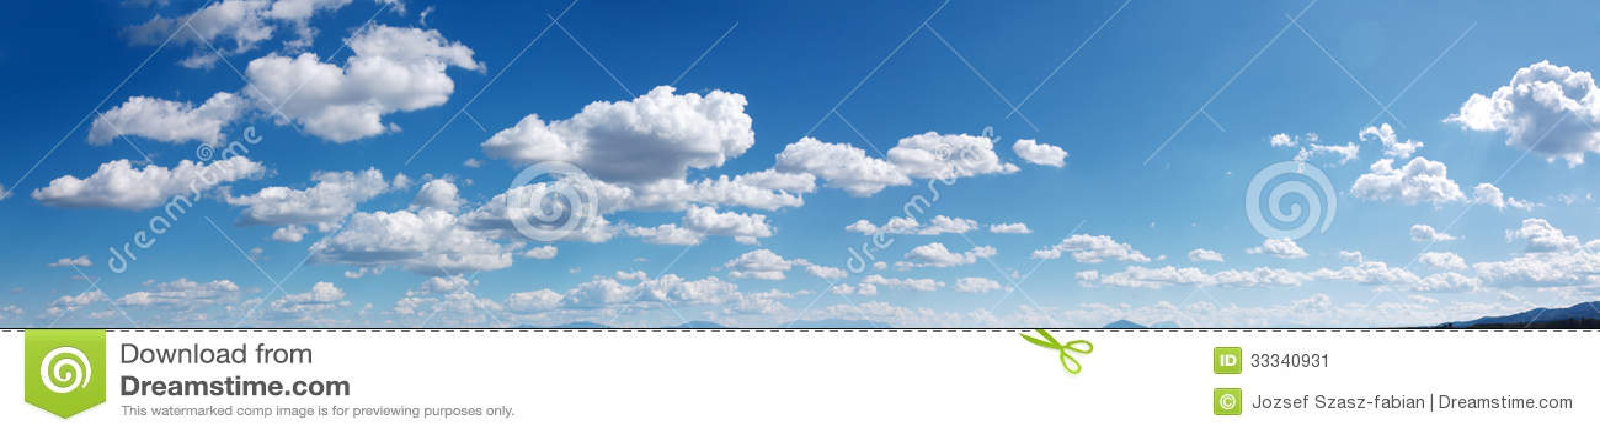 Panorama do céu